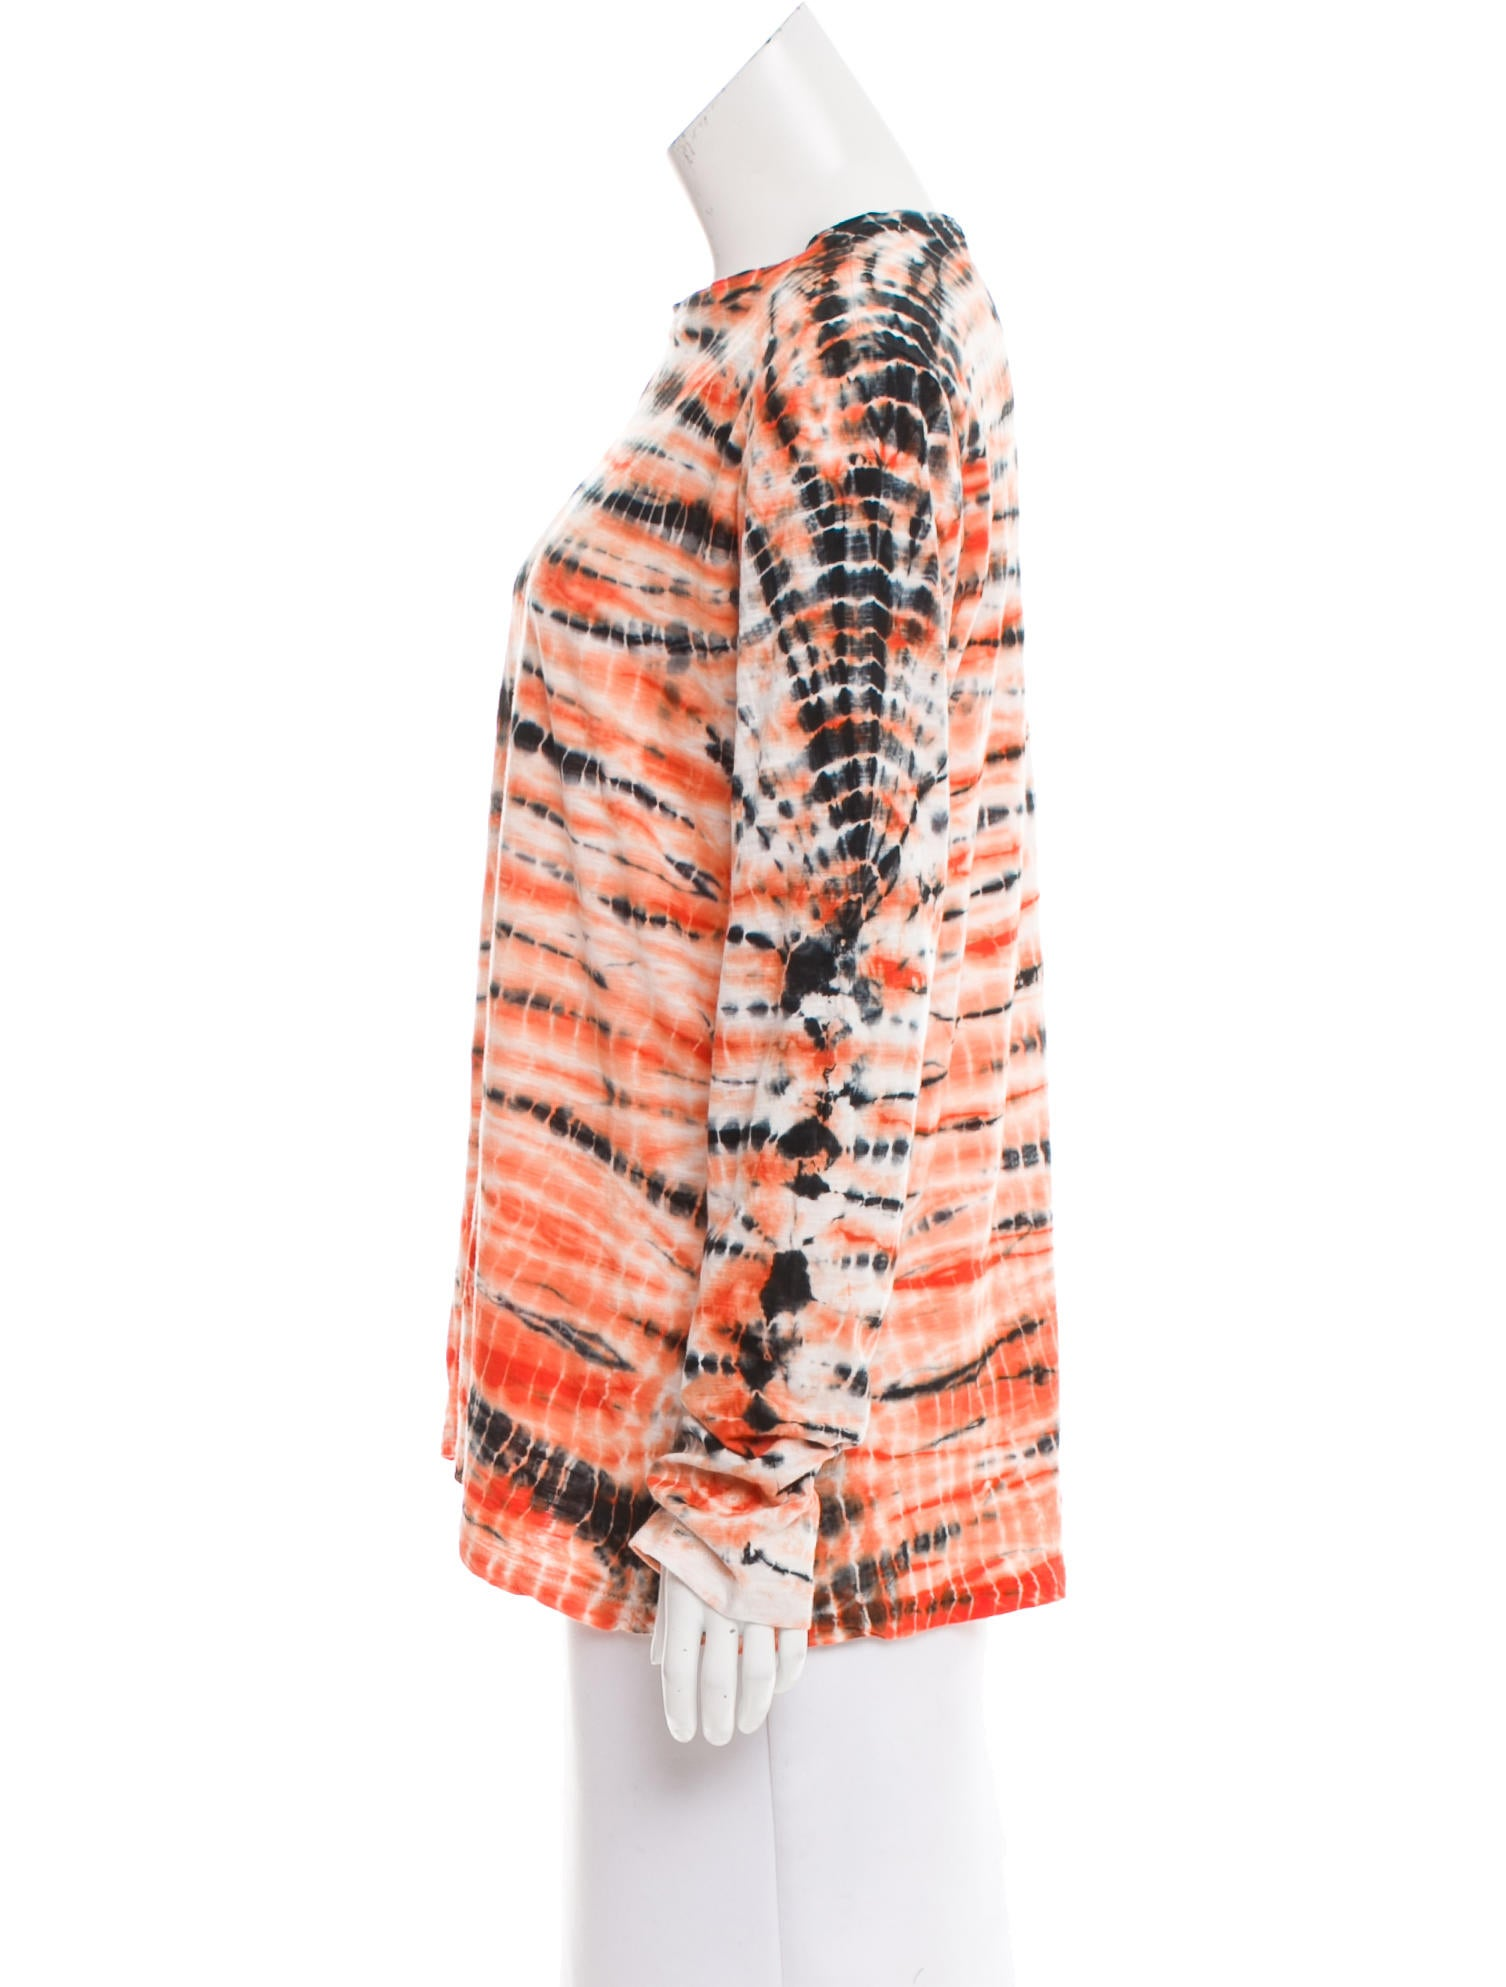 Proenza schouler tie dye printed top clothing pro34623 for Tie dye printed shirts